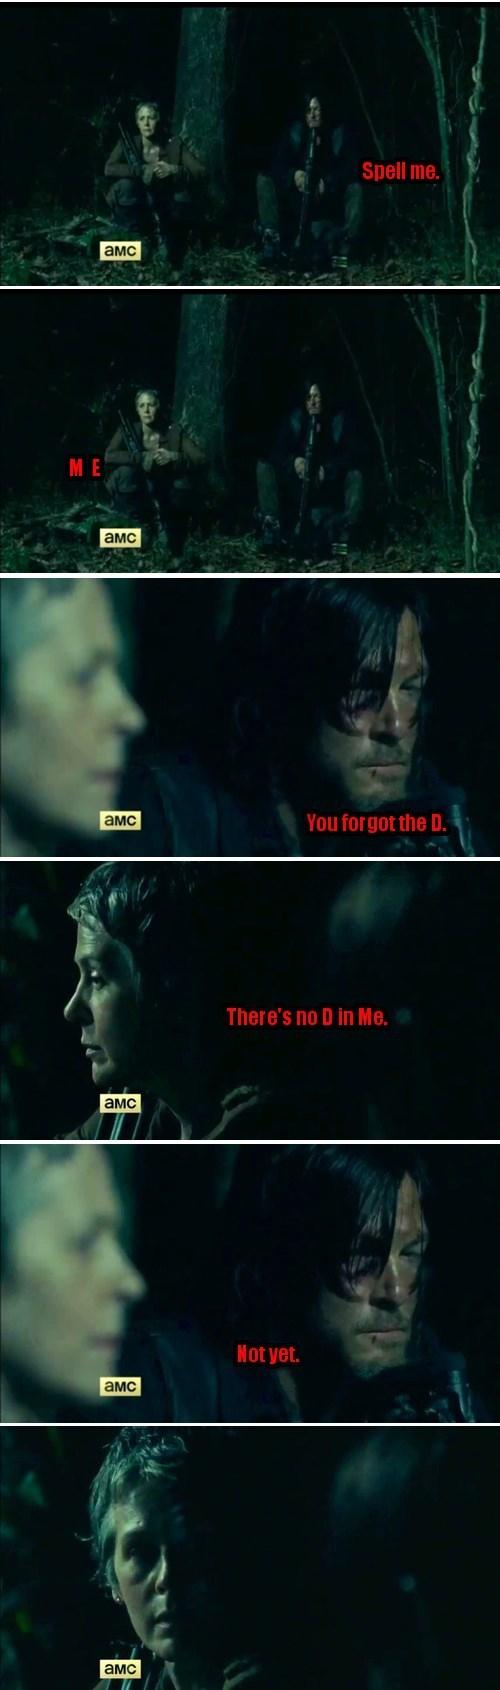 daryl dixon The Walking Dead carol peletier - 8353304064